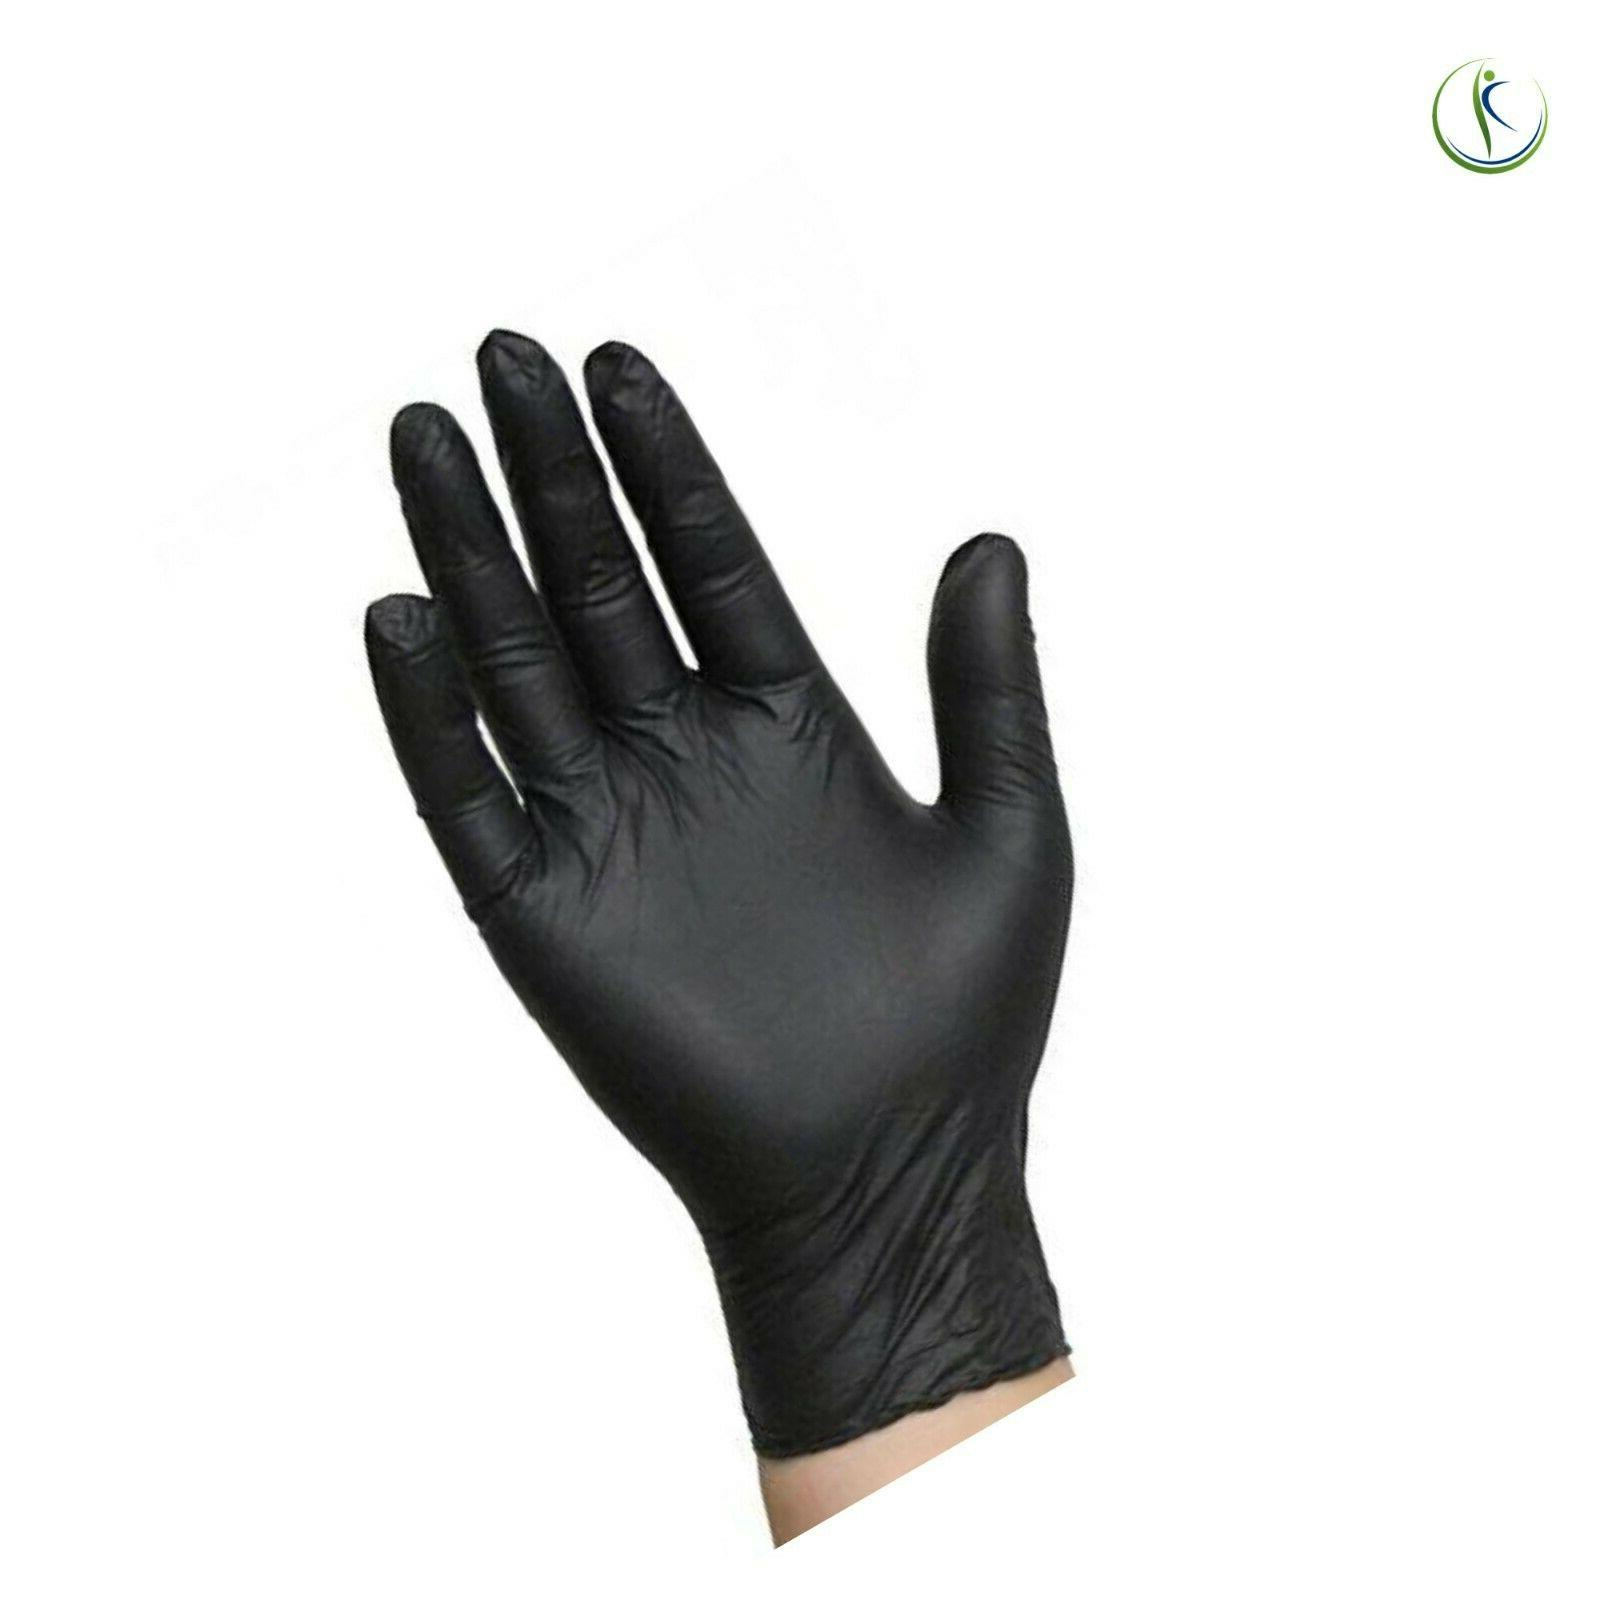 Nitrile Disposable Gloves Powder-Free Dental 5 Mil